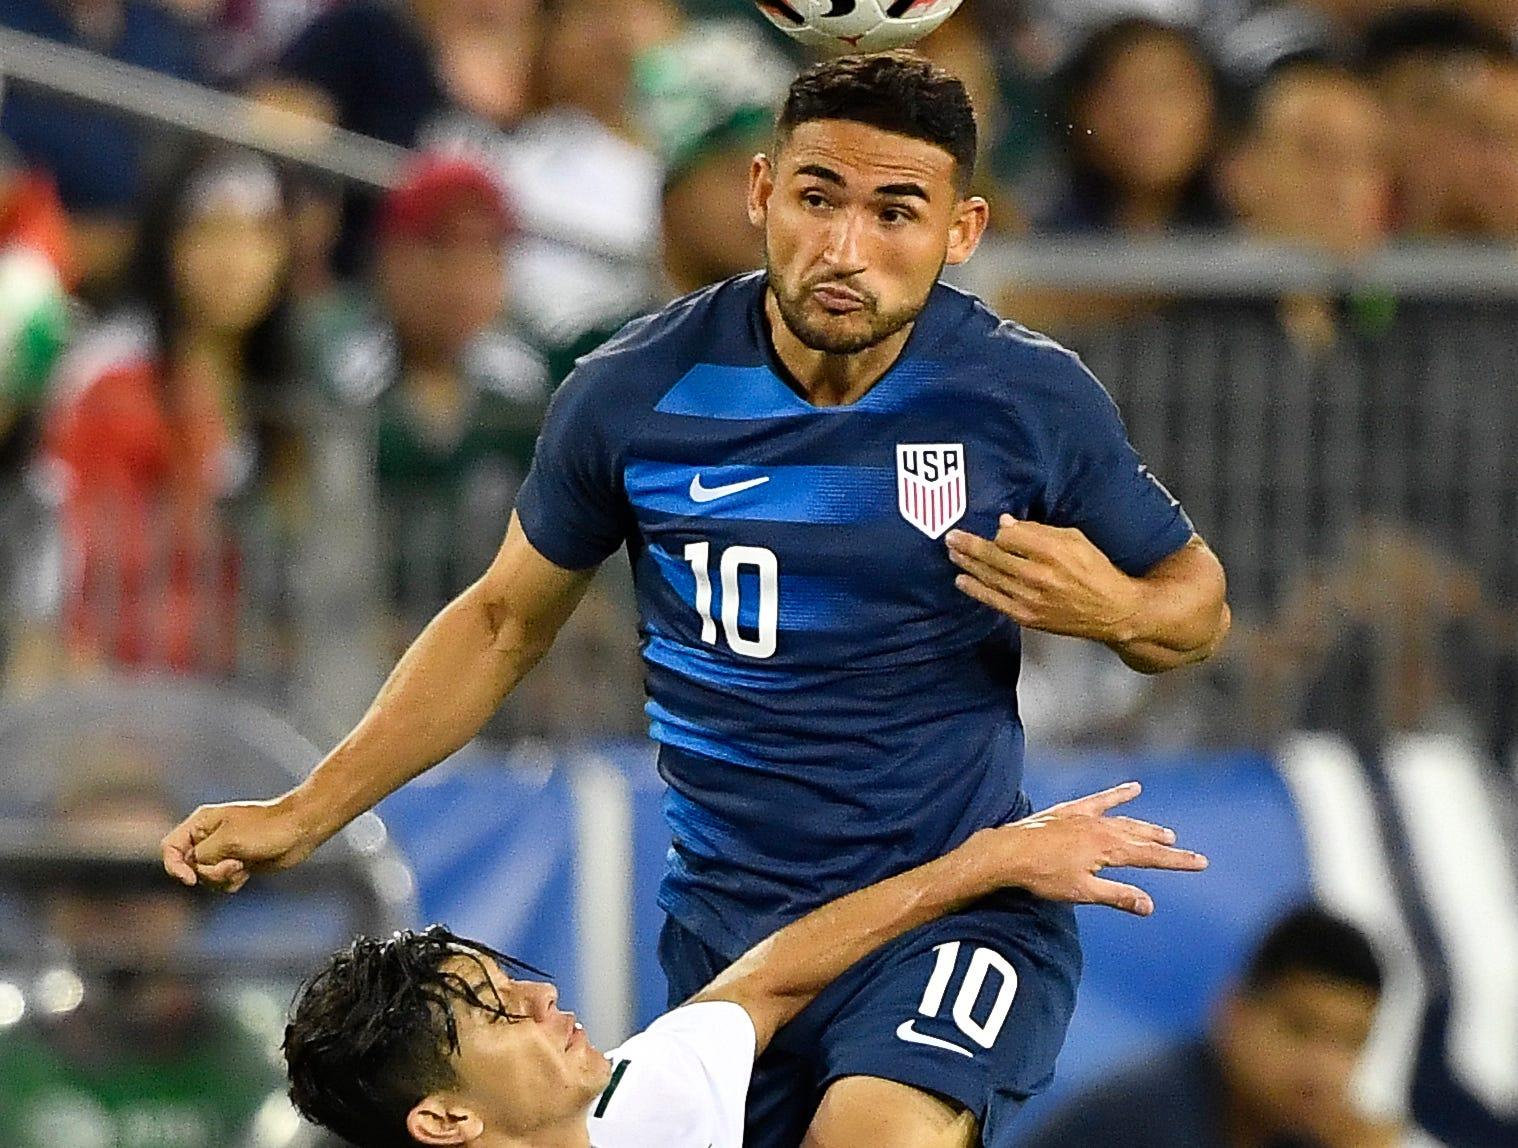 USA midfielder Cristian Roldan (10) heads the ball over Mexico defender Gerardo Arteaga (17) during the second half at Nissan Stadium Tuesday, Sept. 11, 2018, in Nashville, Tenn.